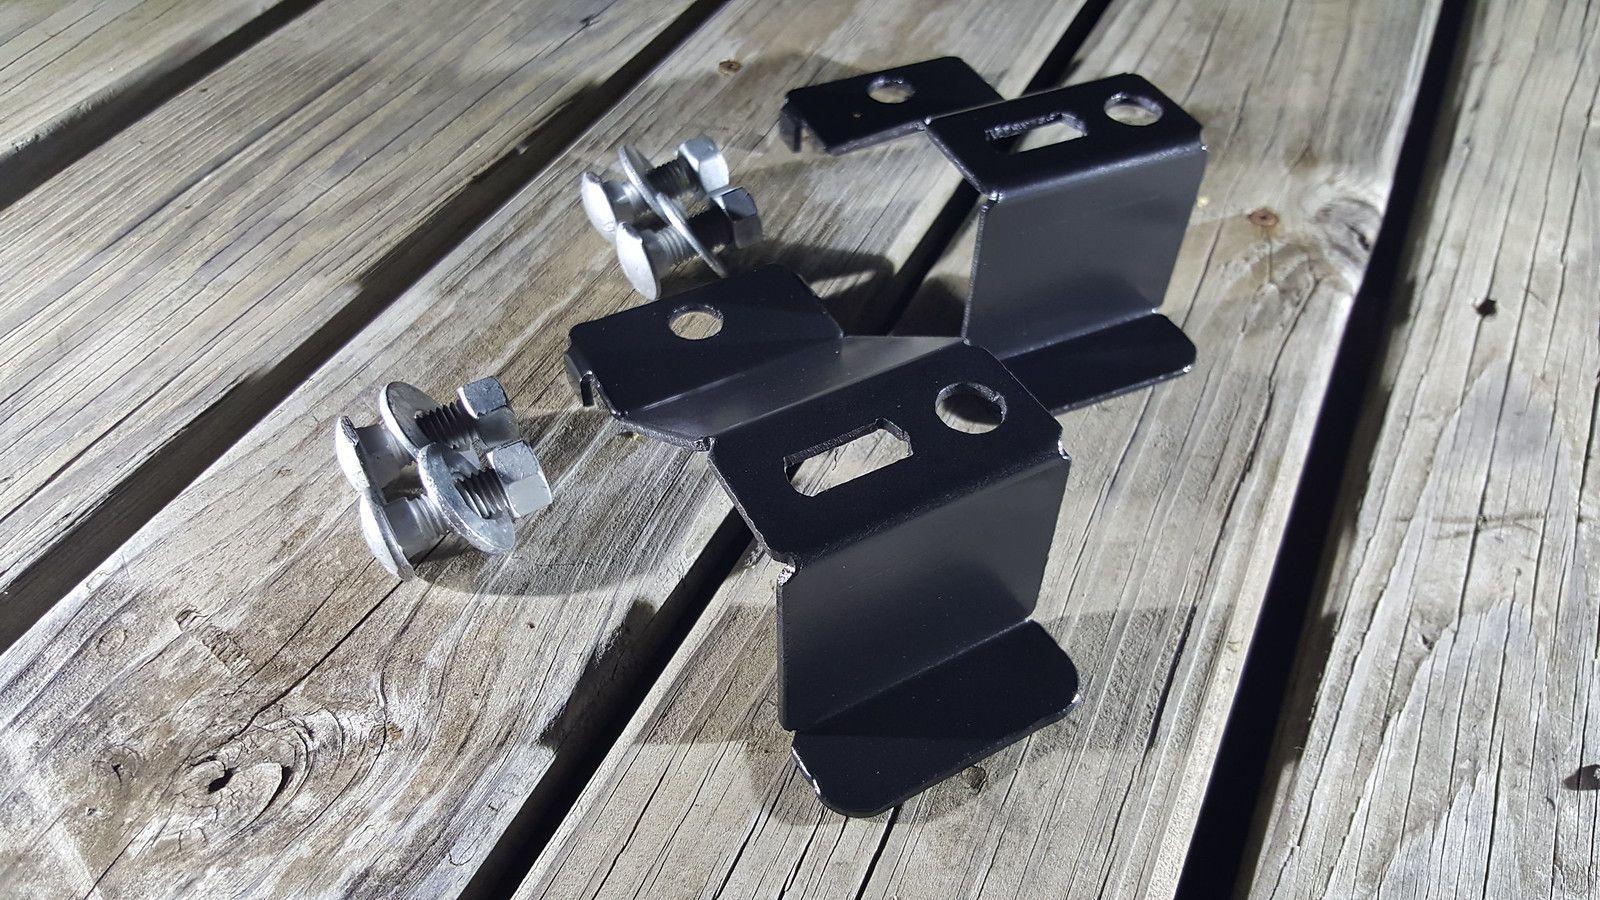 Pin on Dodge ram 1500 accessories